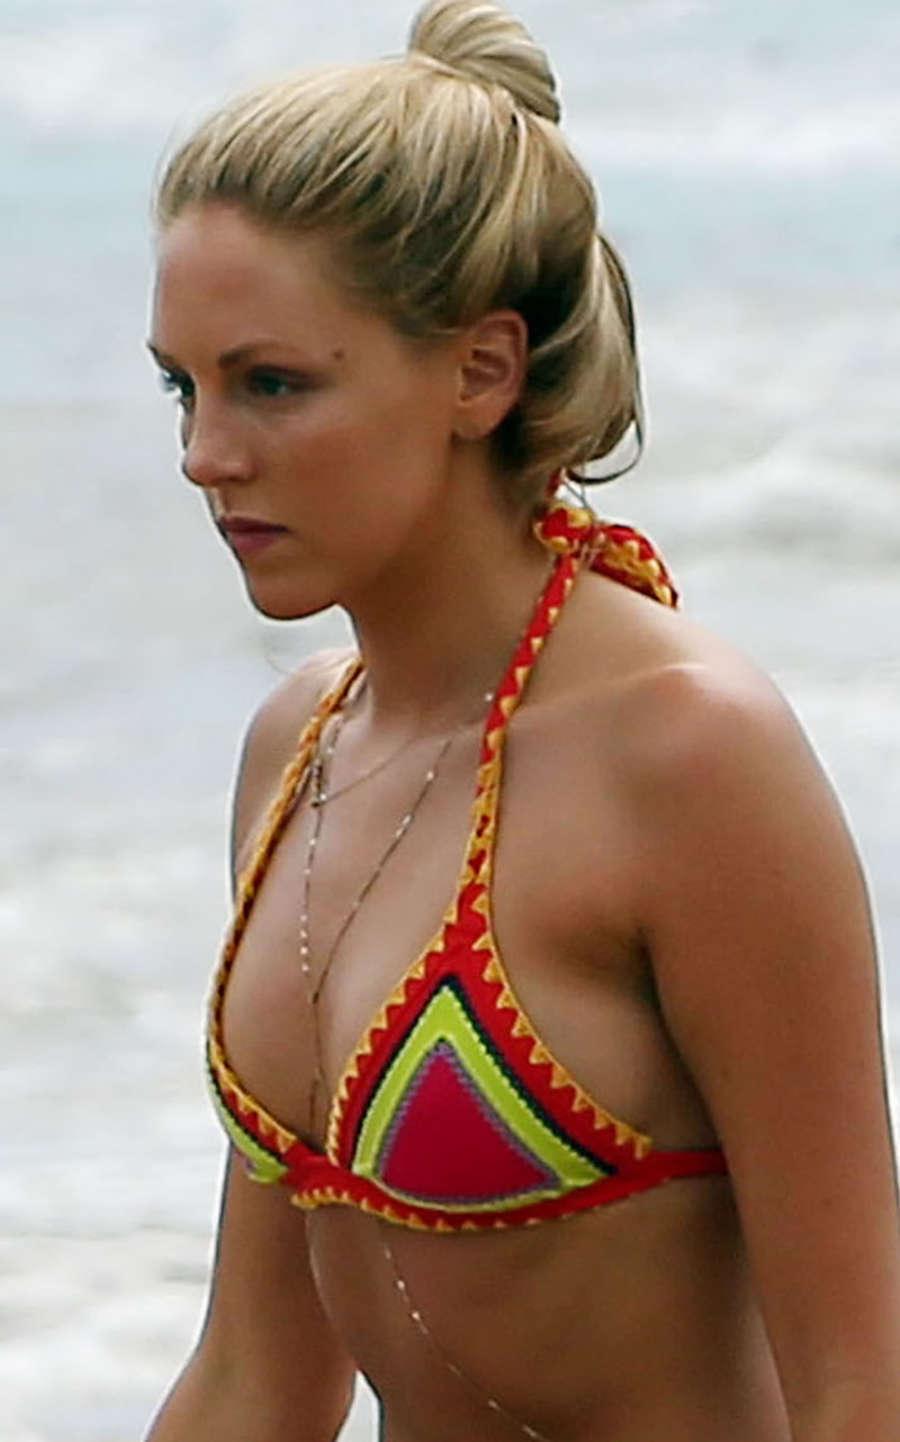 Shea Marie Wearing Bikini in Maui